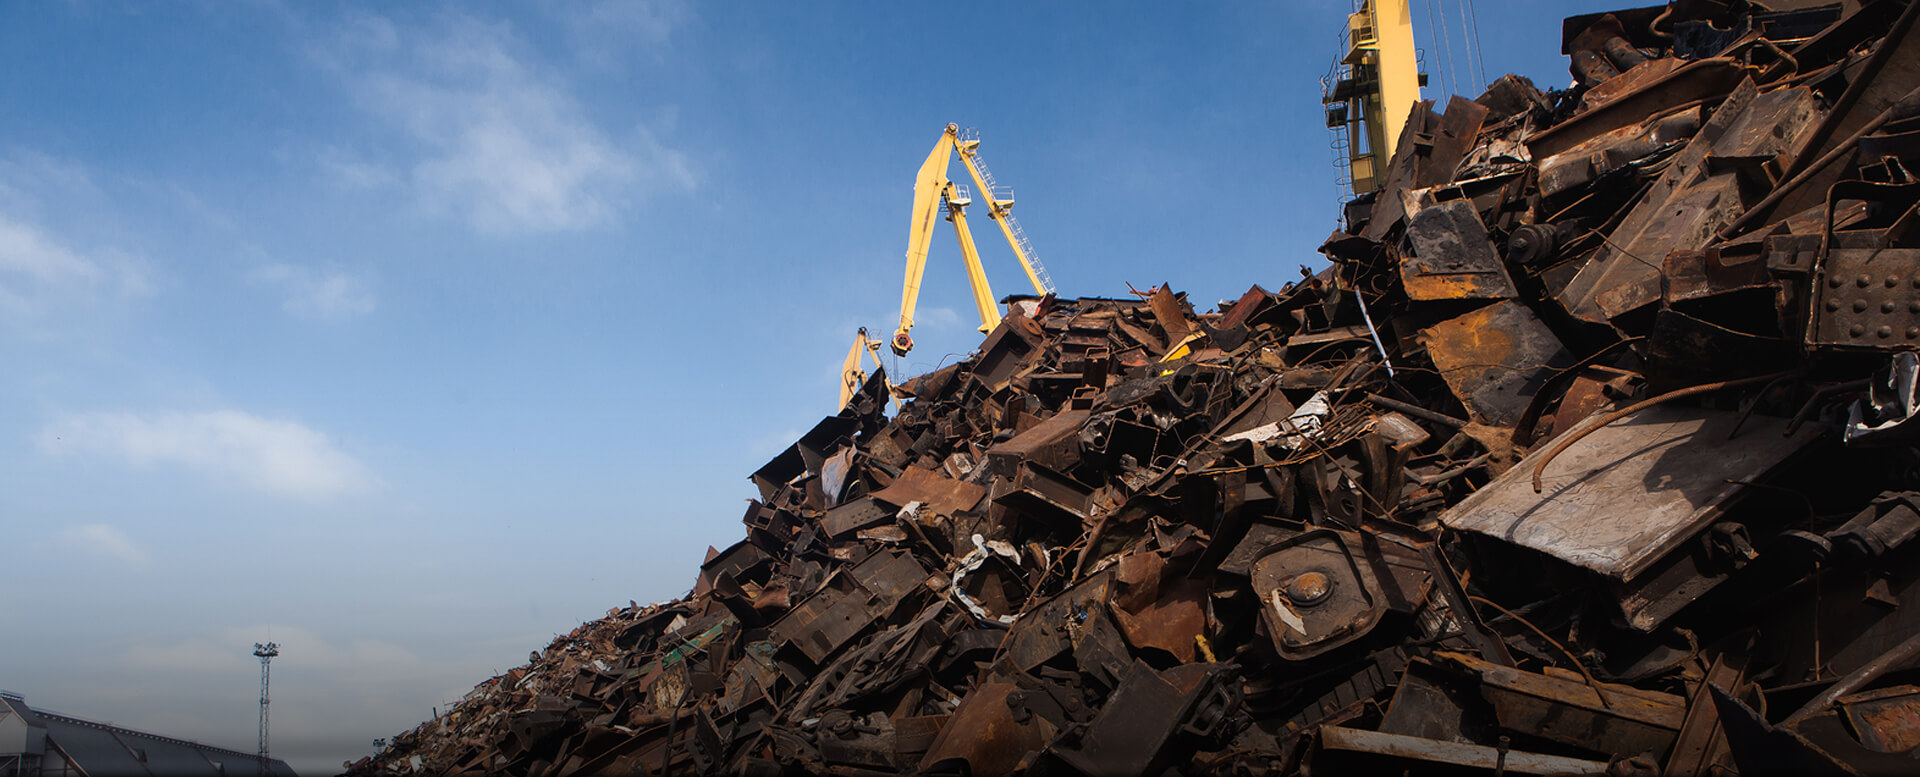 Bell Processing | Wichita Falls Recycling